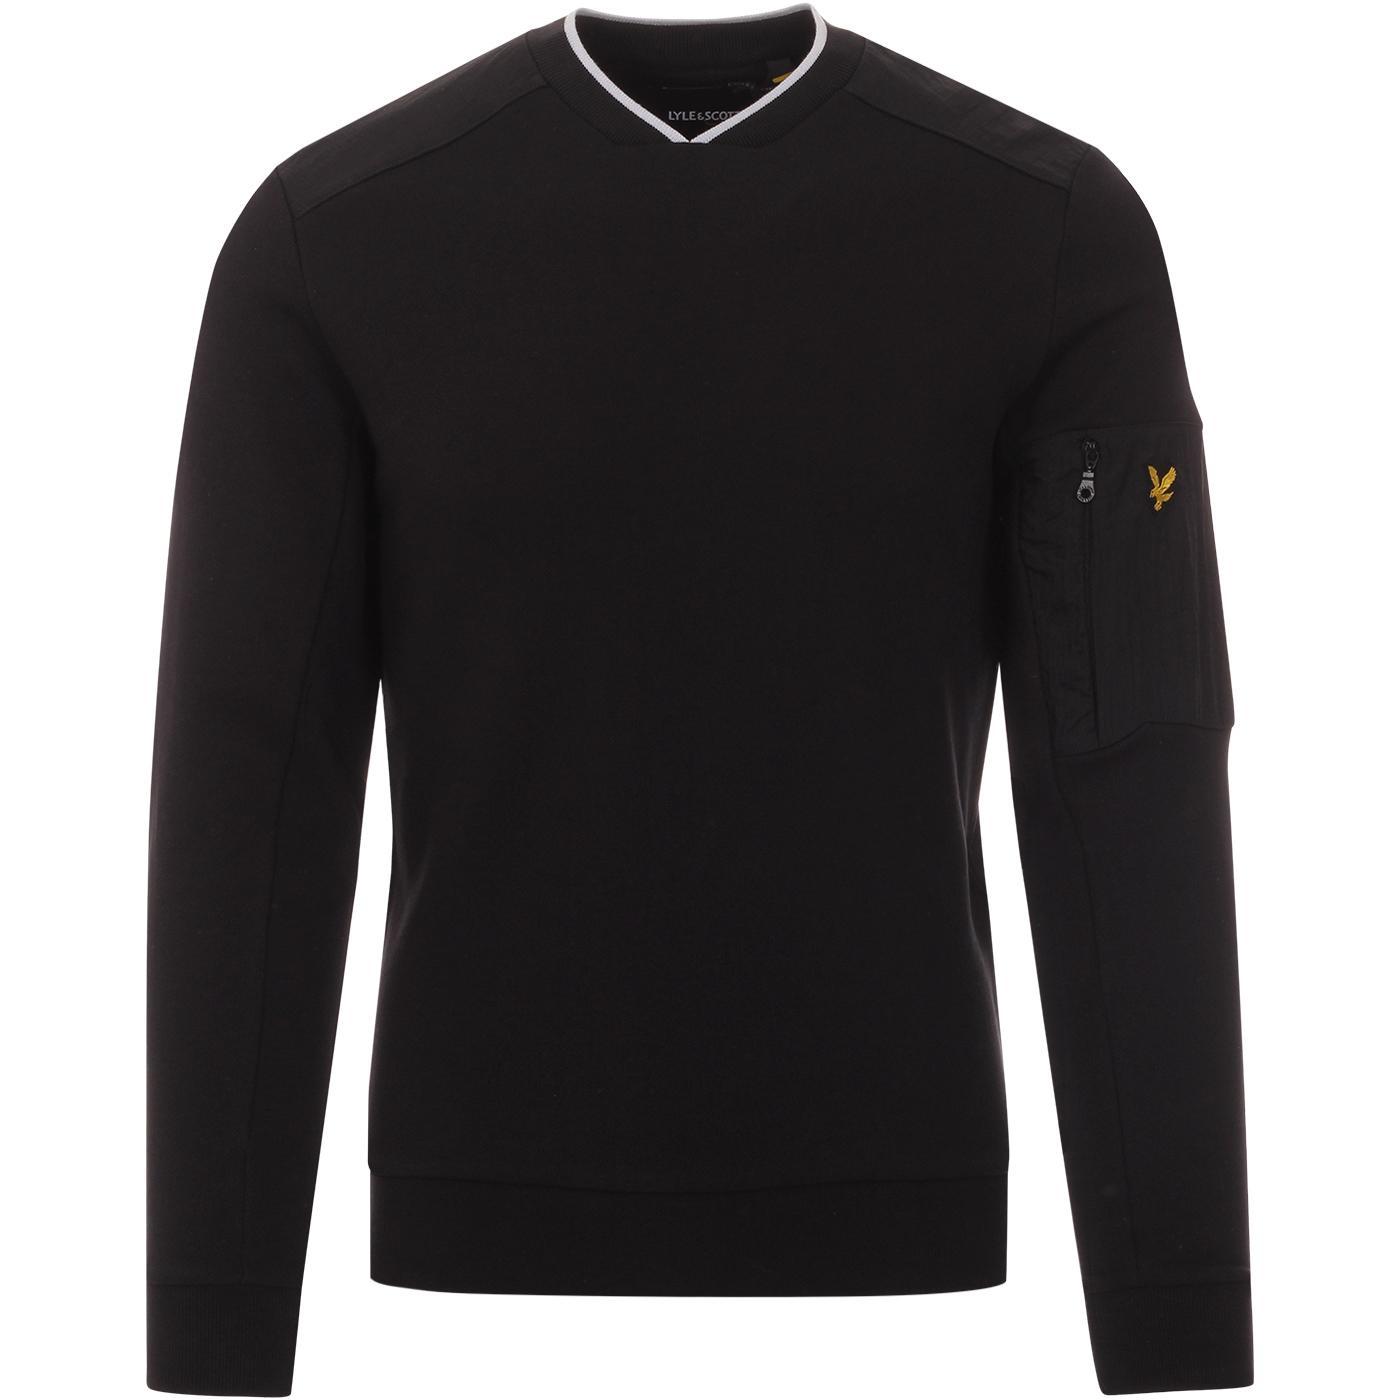 LYLE & SCOTT Nylon Panel Casuals Sweatshirt BLACK